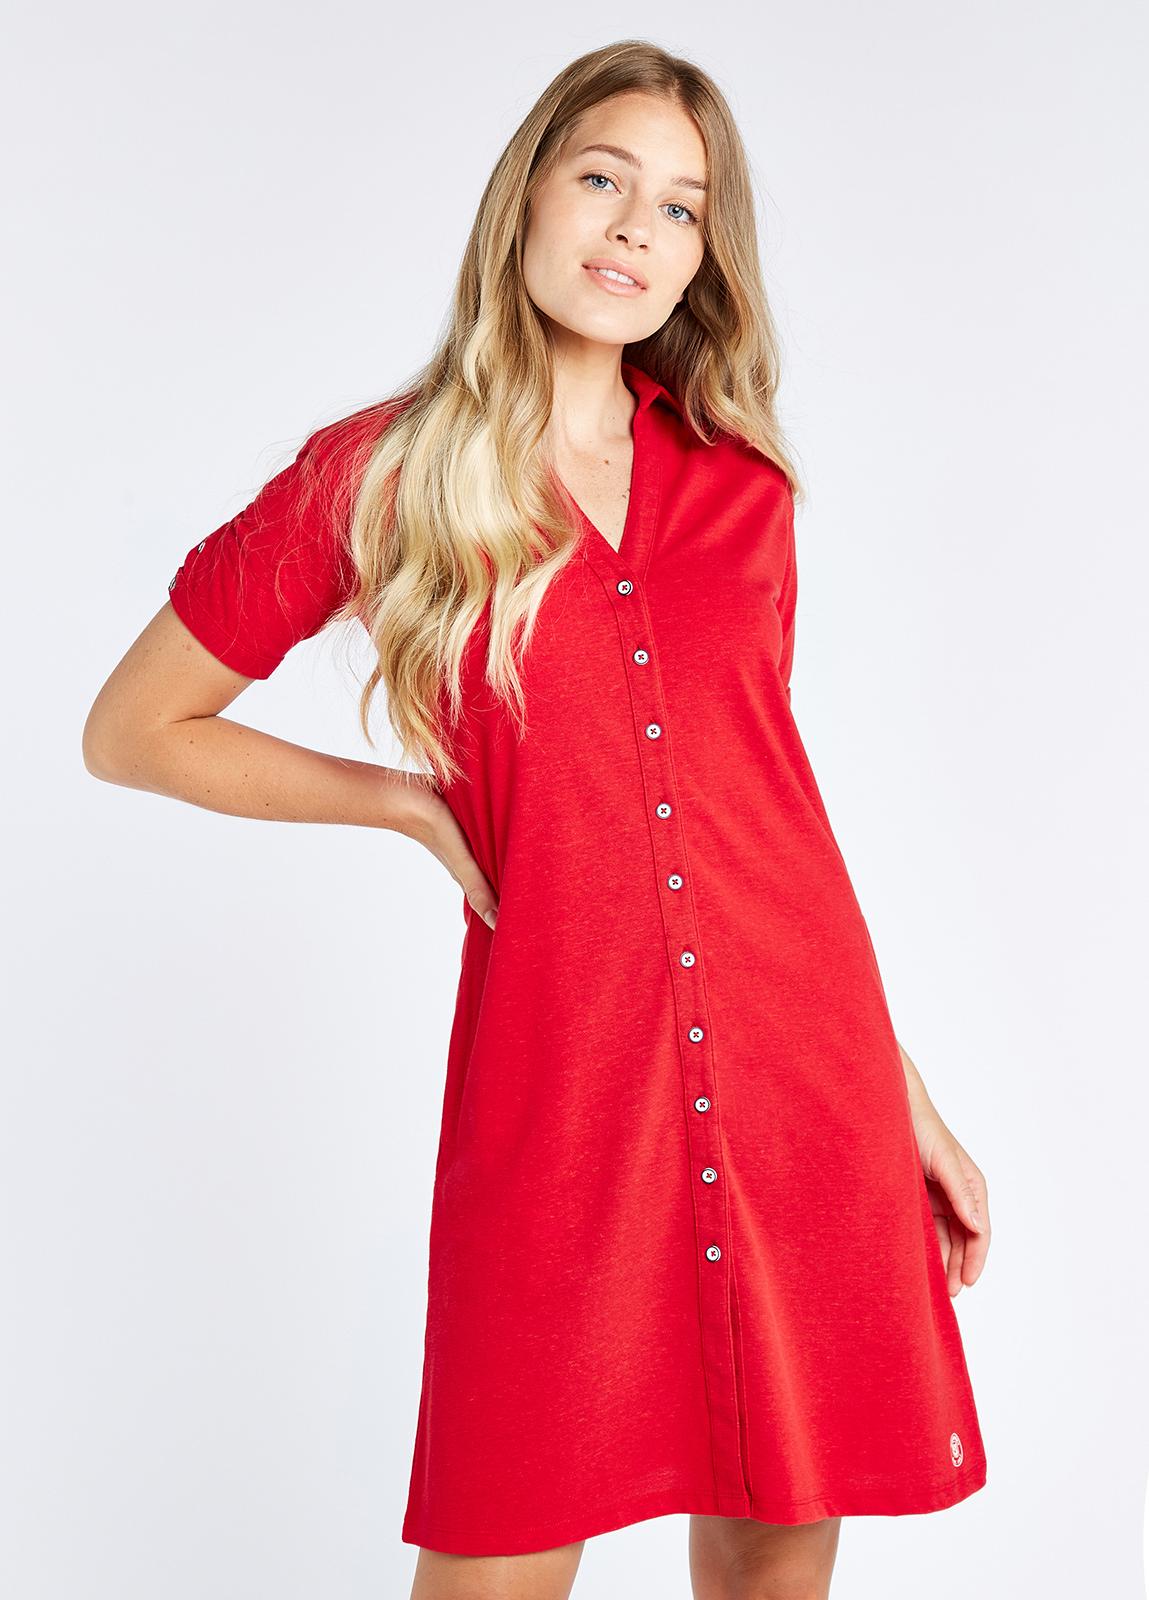 Druid Shirt Dress - Cardinal